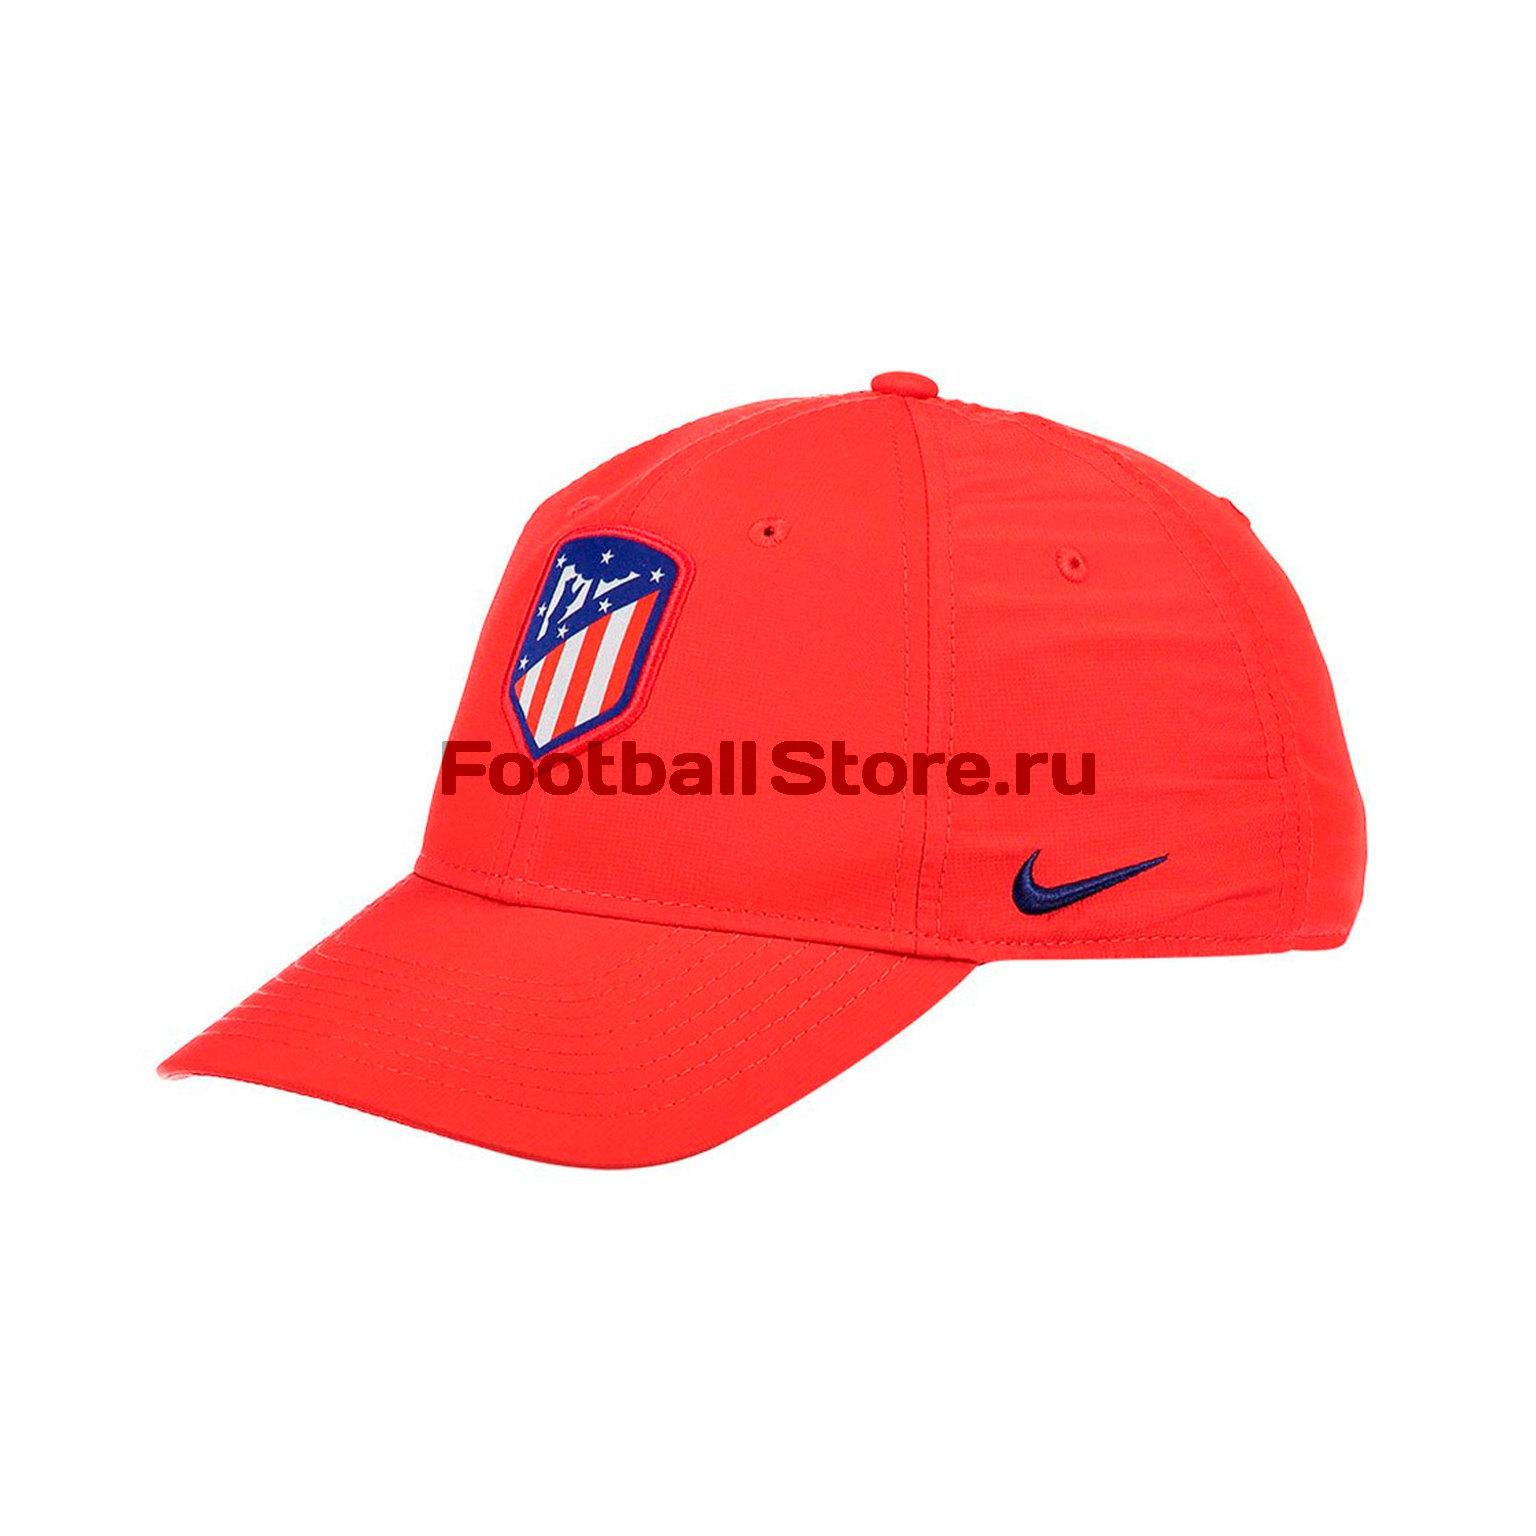 Бейсболка Nike Atletico Madrid Cap BV6414-611